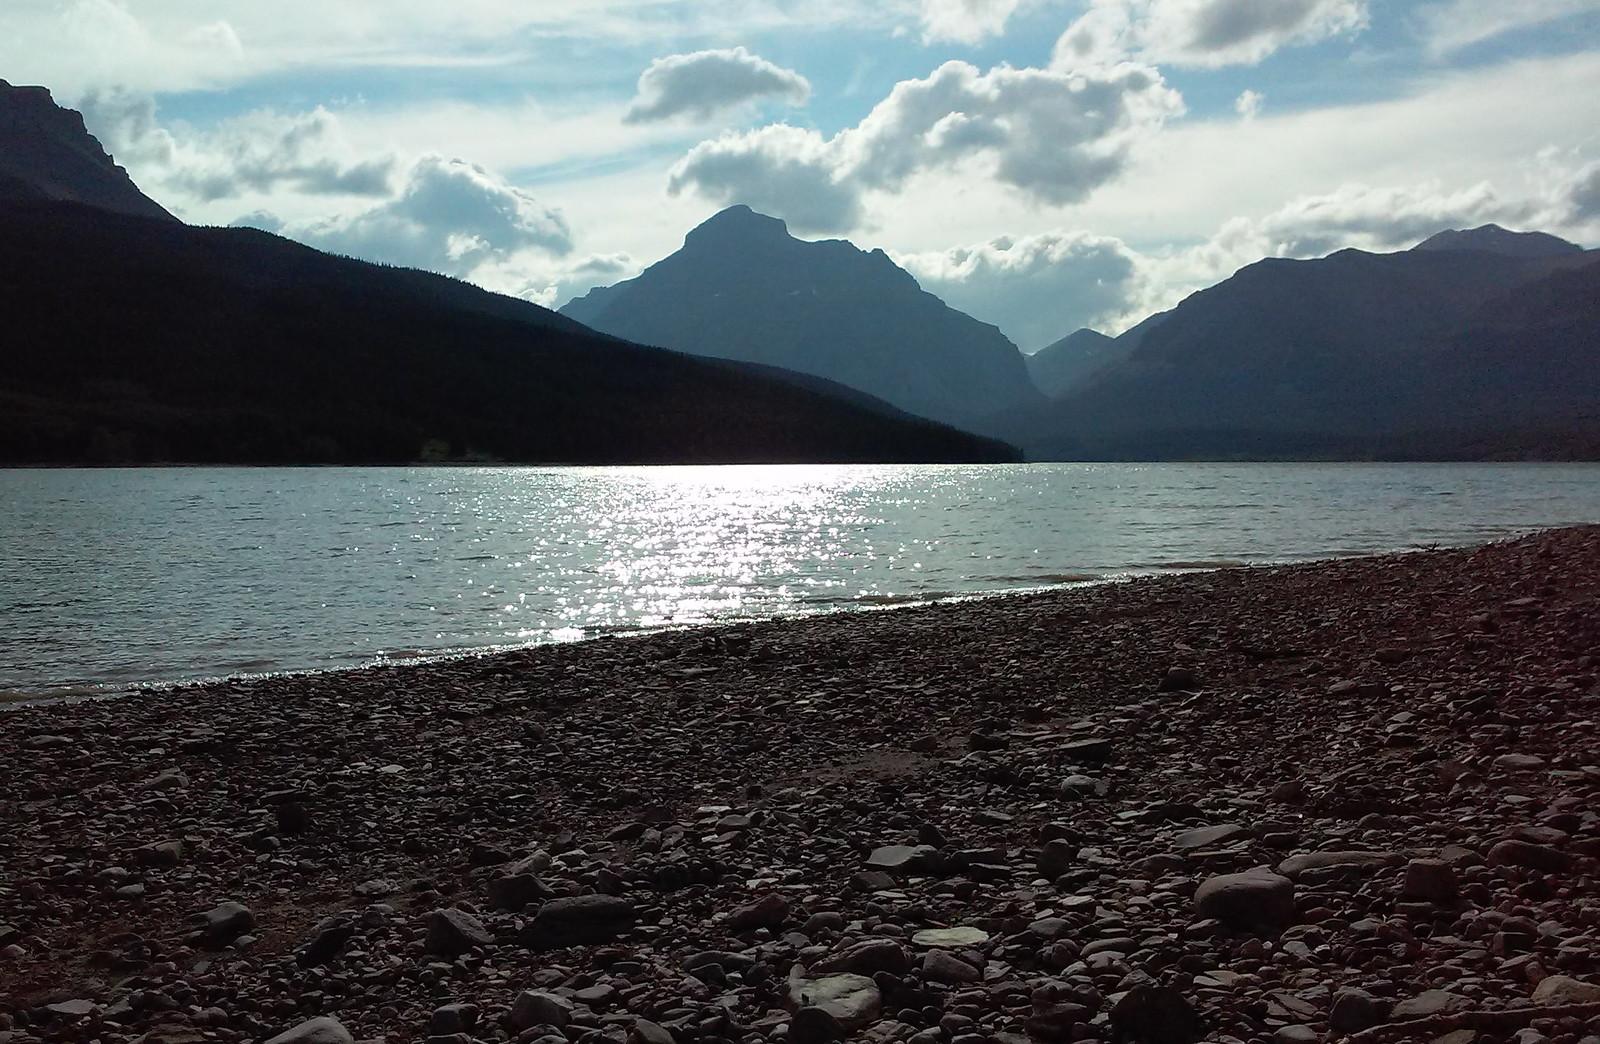 Lower Two Medicine Lake, Montana